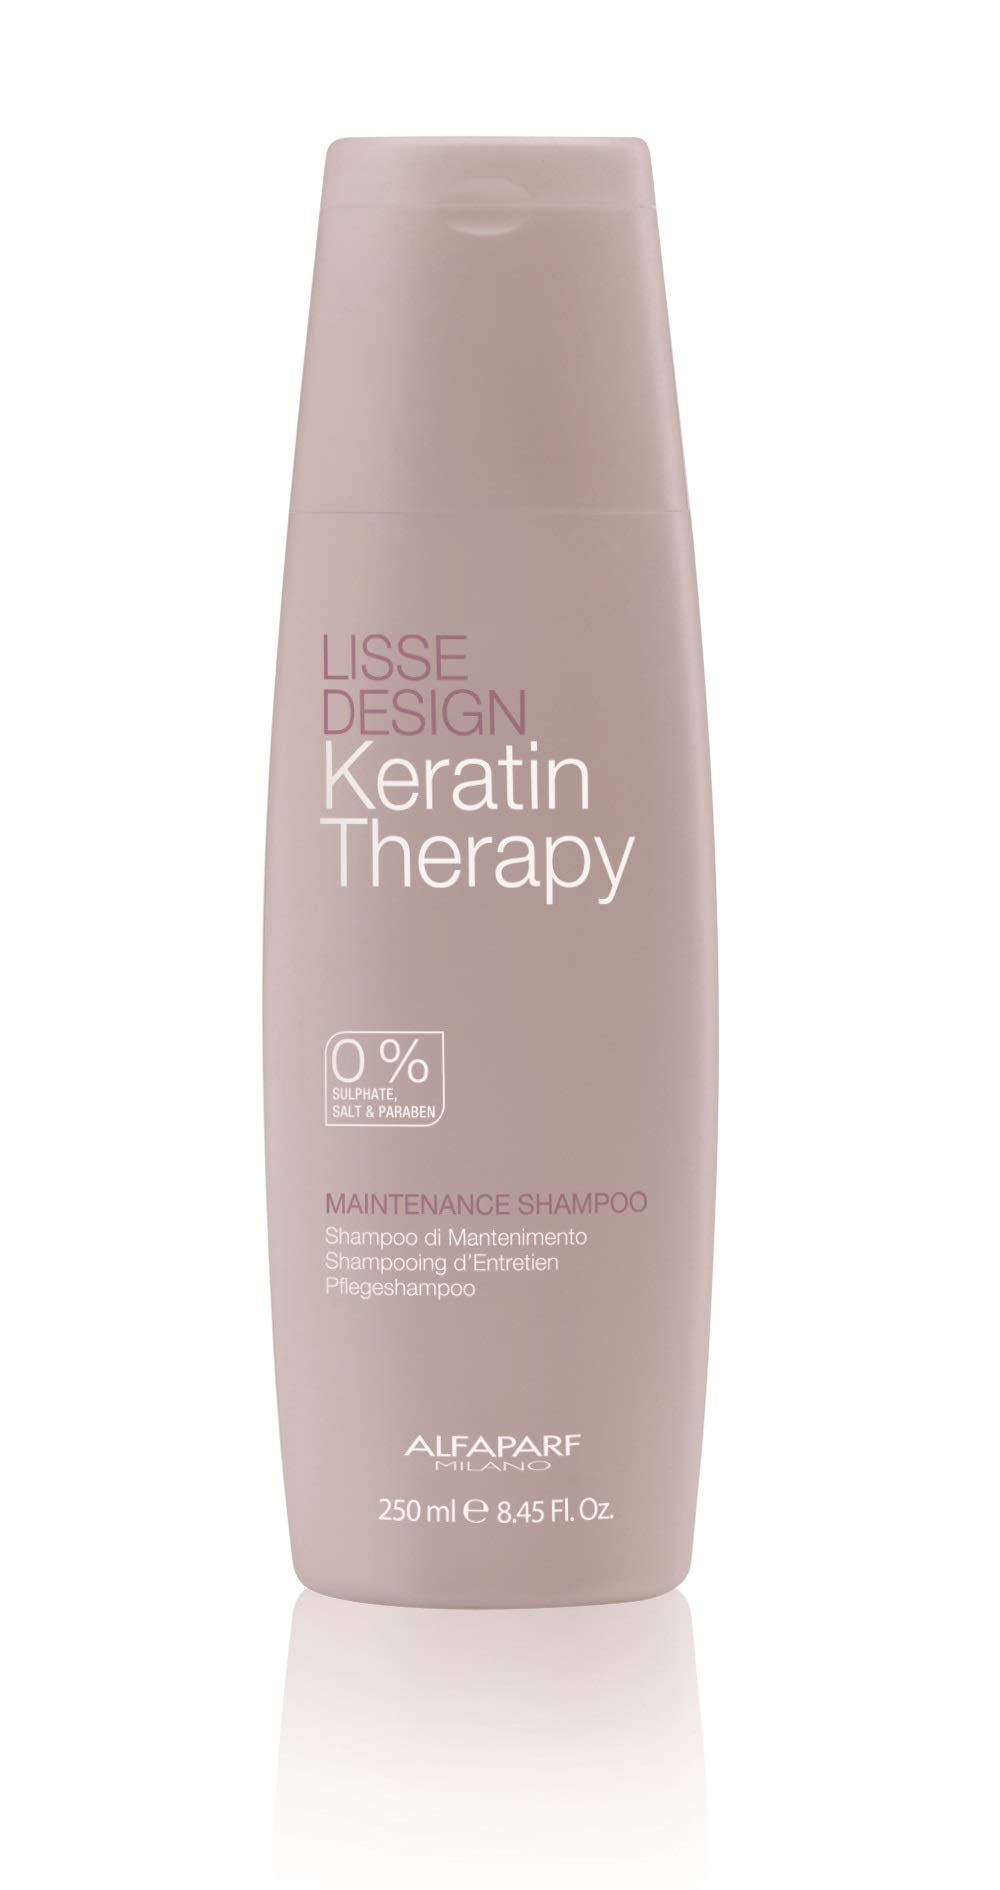 Alfaparf Milano Keratin Therapy Lisse Design Maintenance Shampoo - Sulfate Free - Maintains and Enhances Keratin Treatments - Professional Salon Quality - 8.45 Fl Oz